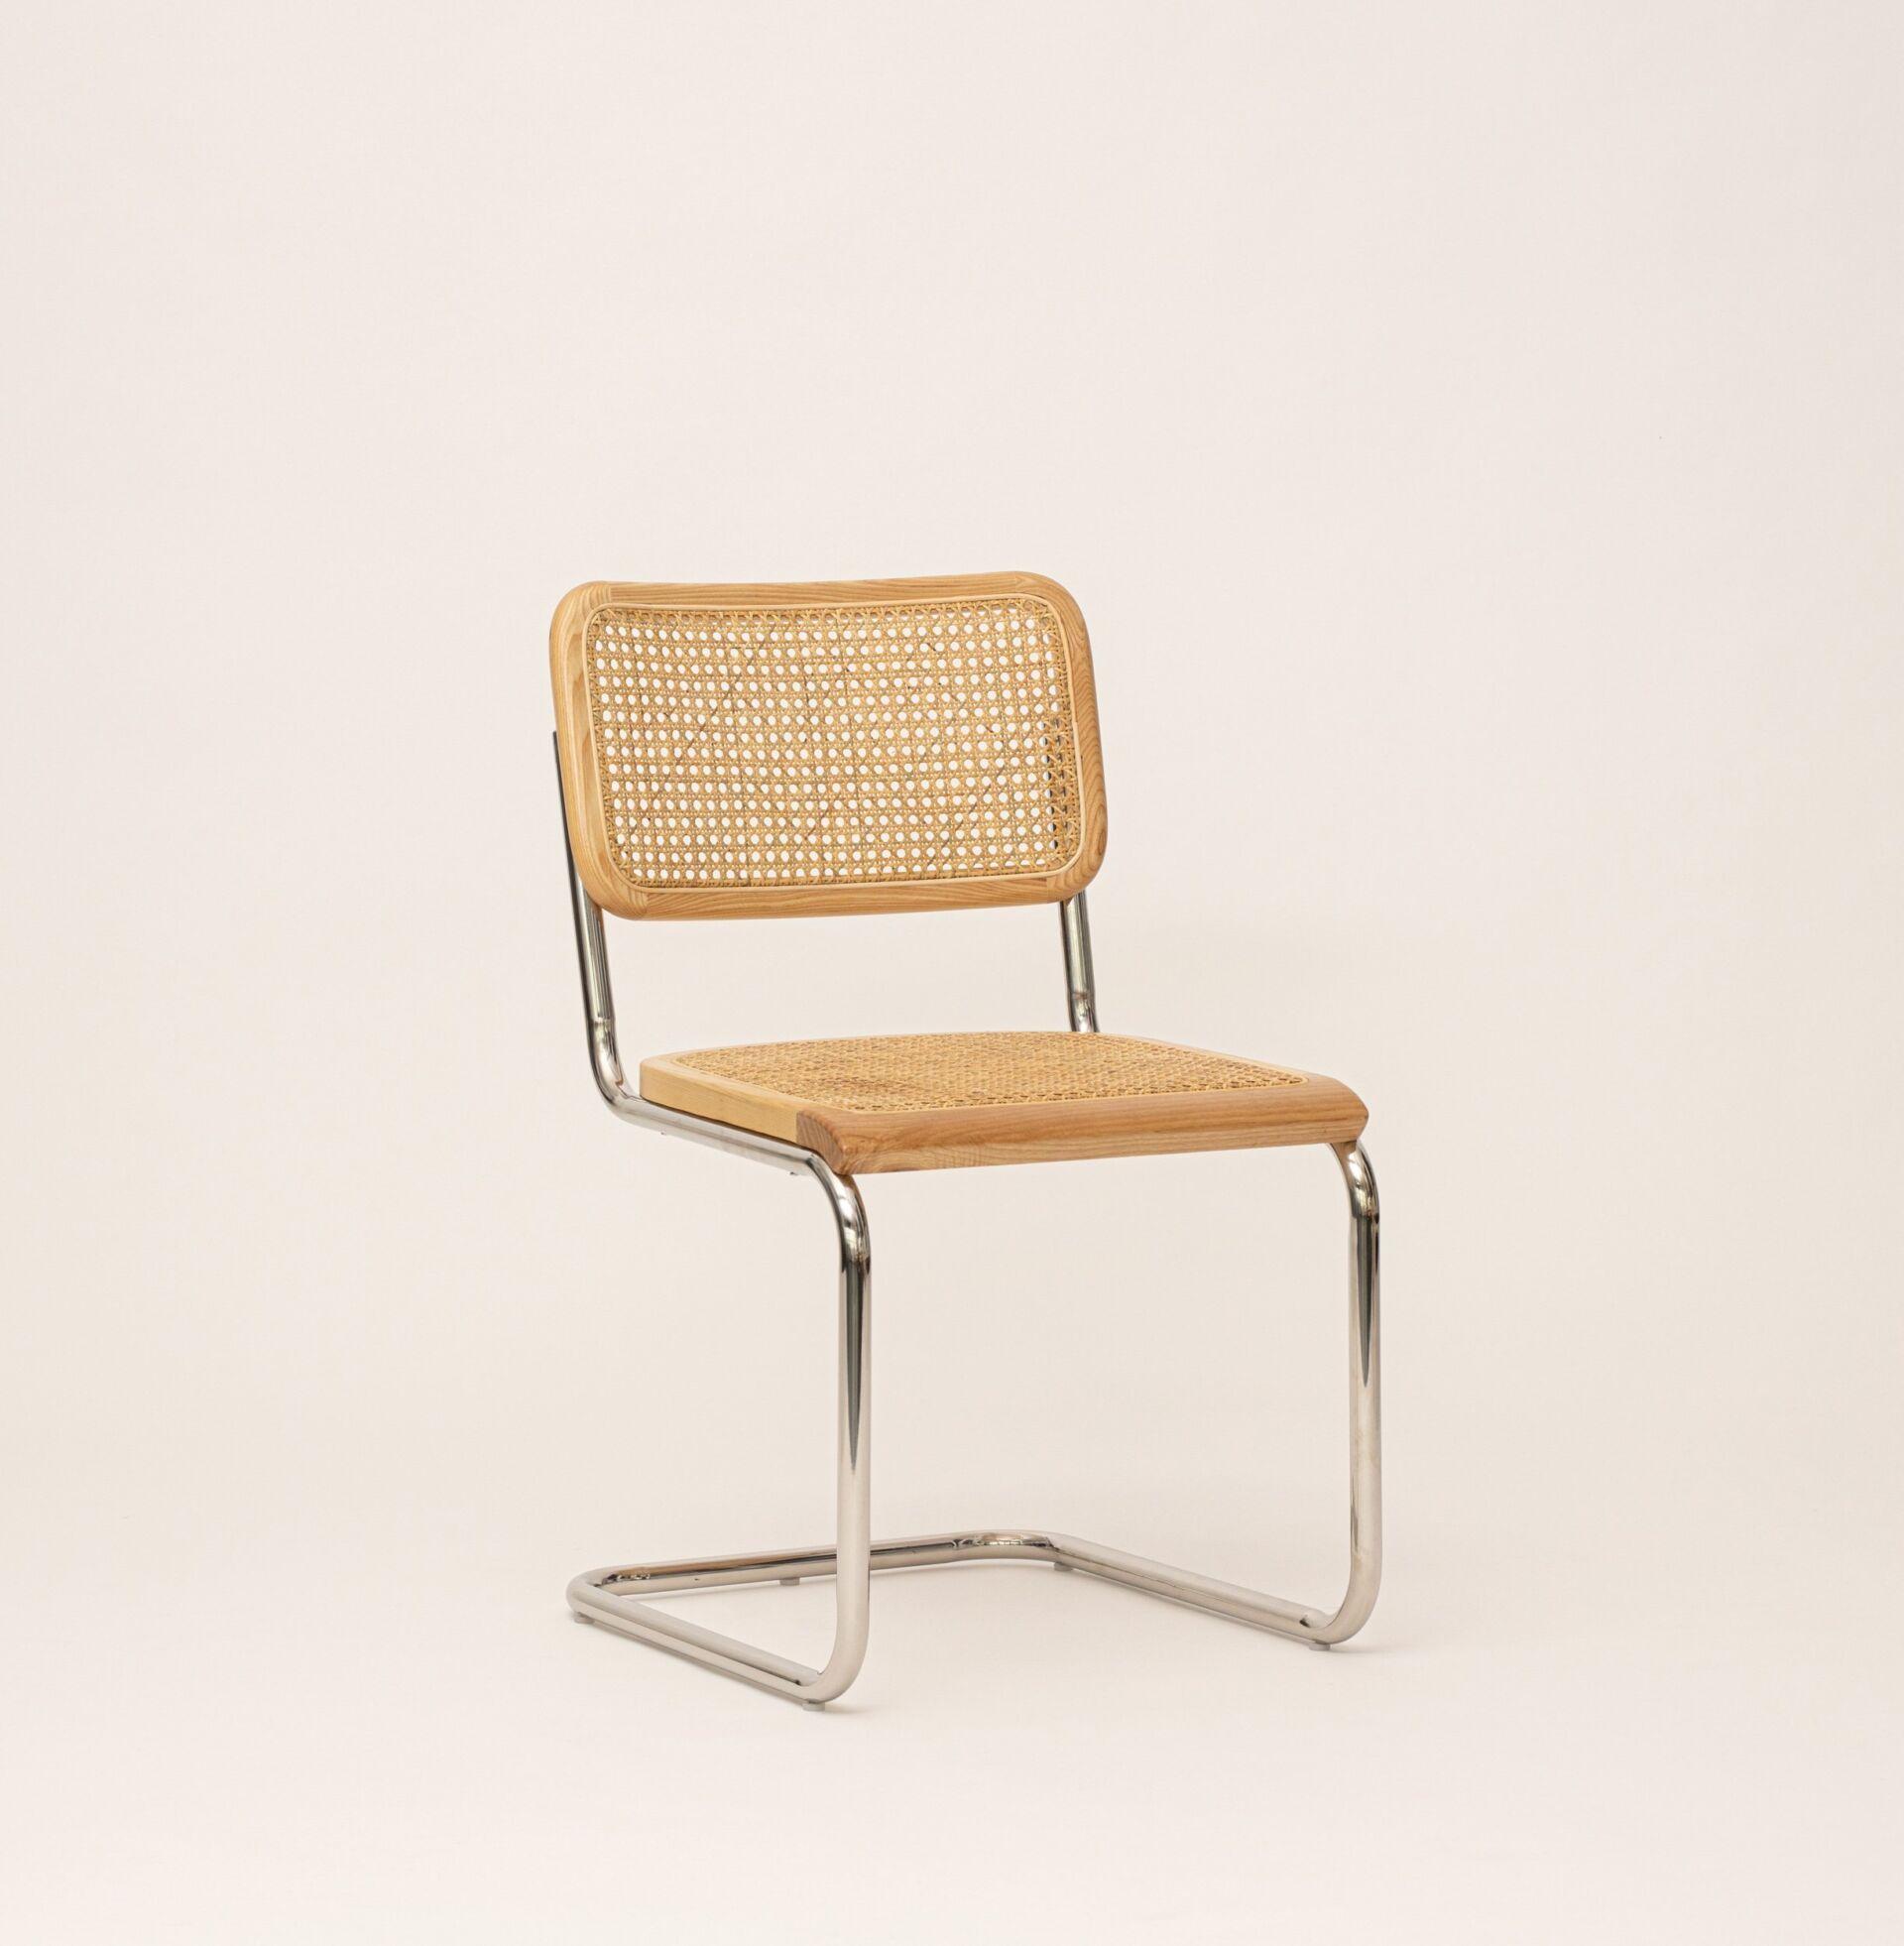 Chrome & Cane Rattan Dining Chair - Natural